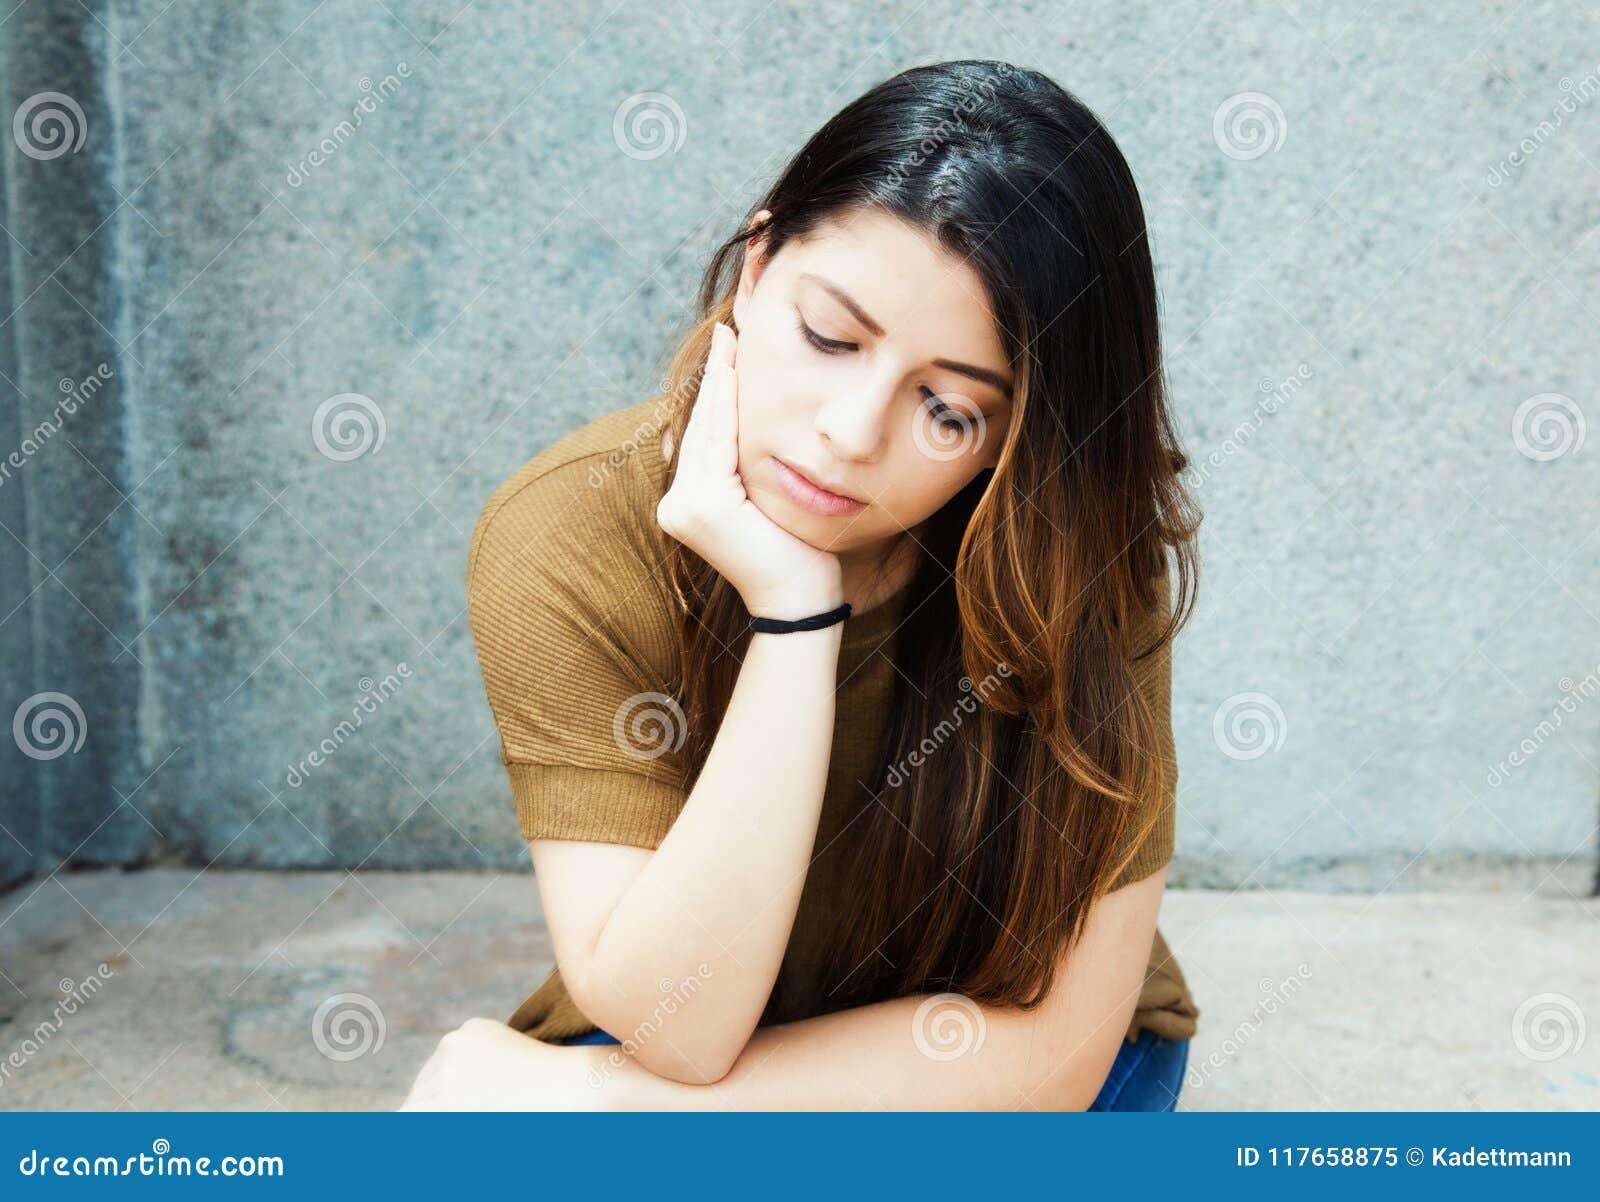 Traurige lateinamerikanische junge erwachsene Frau